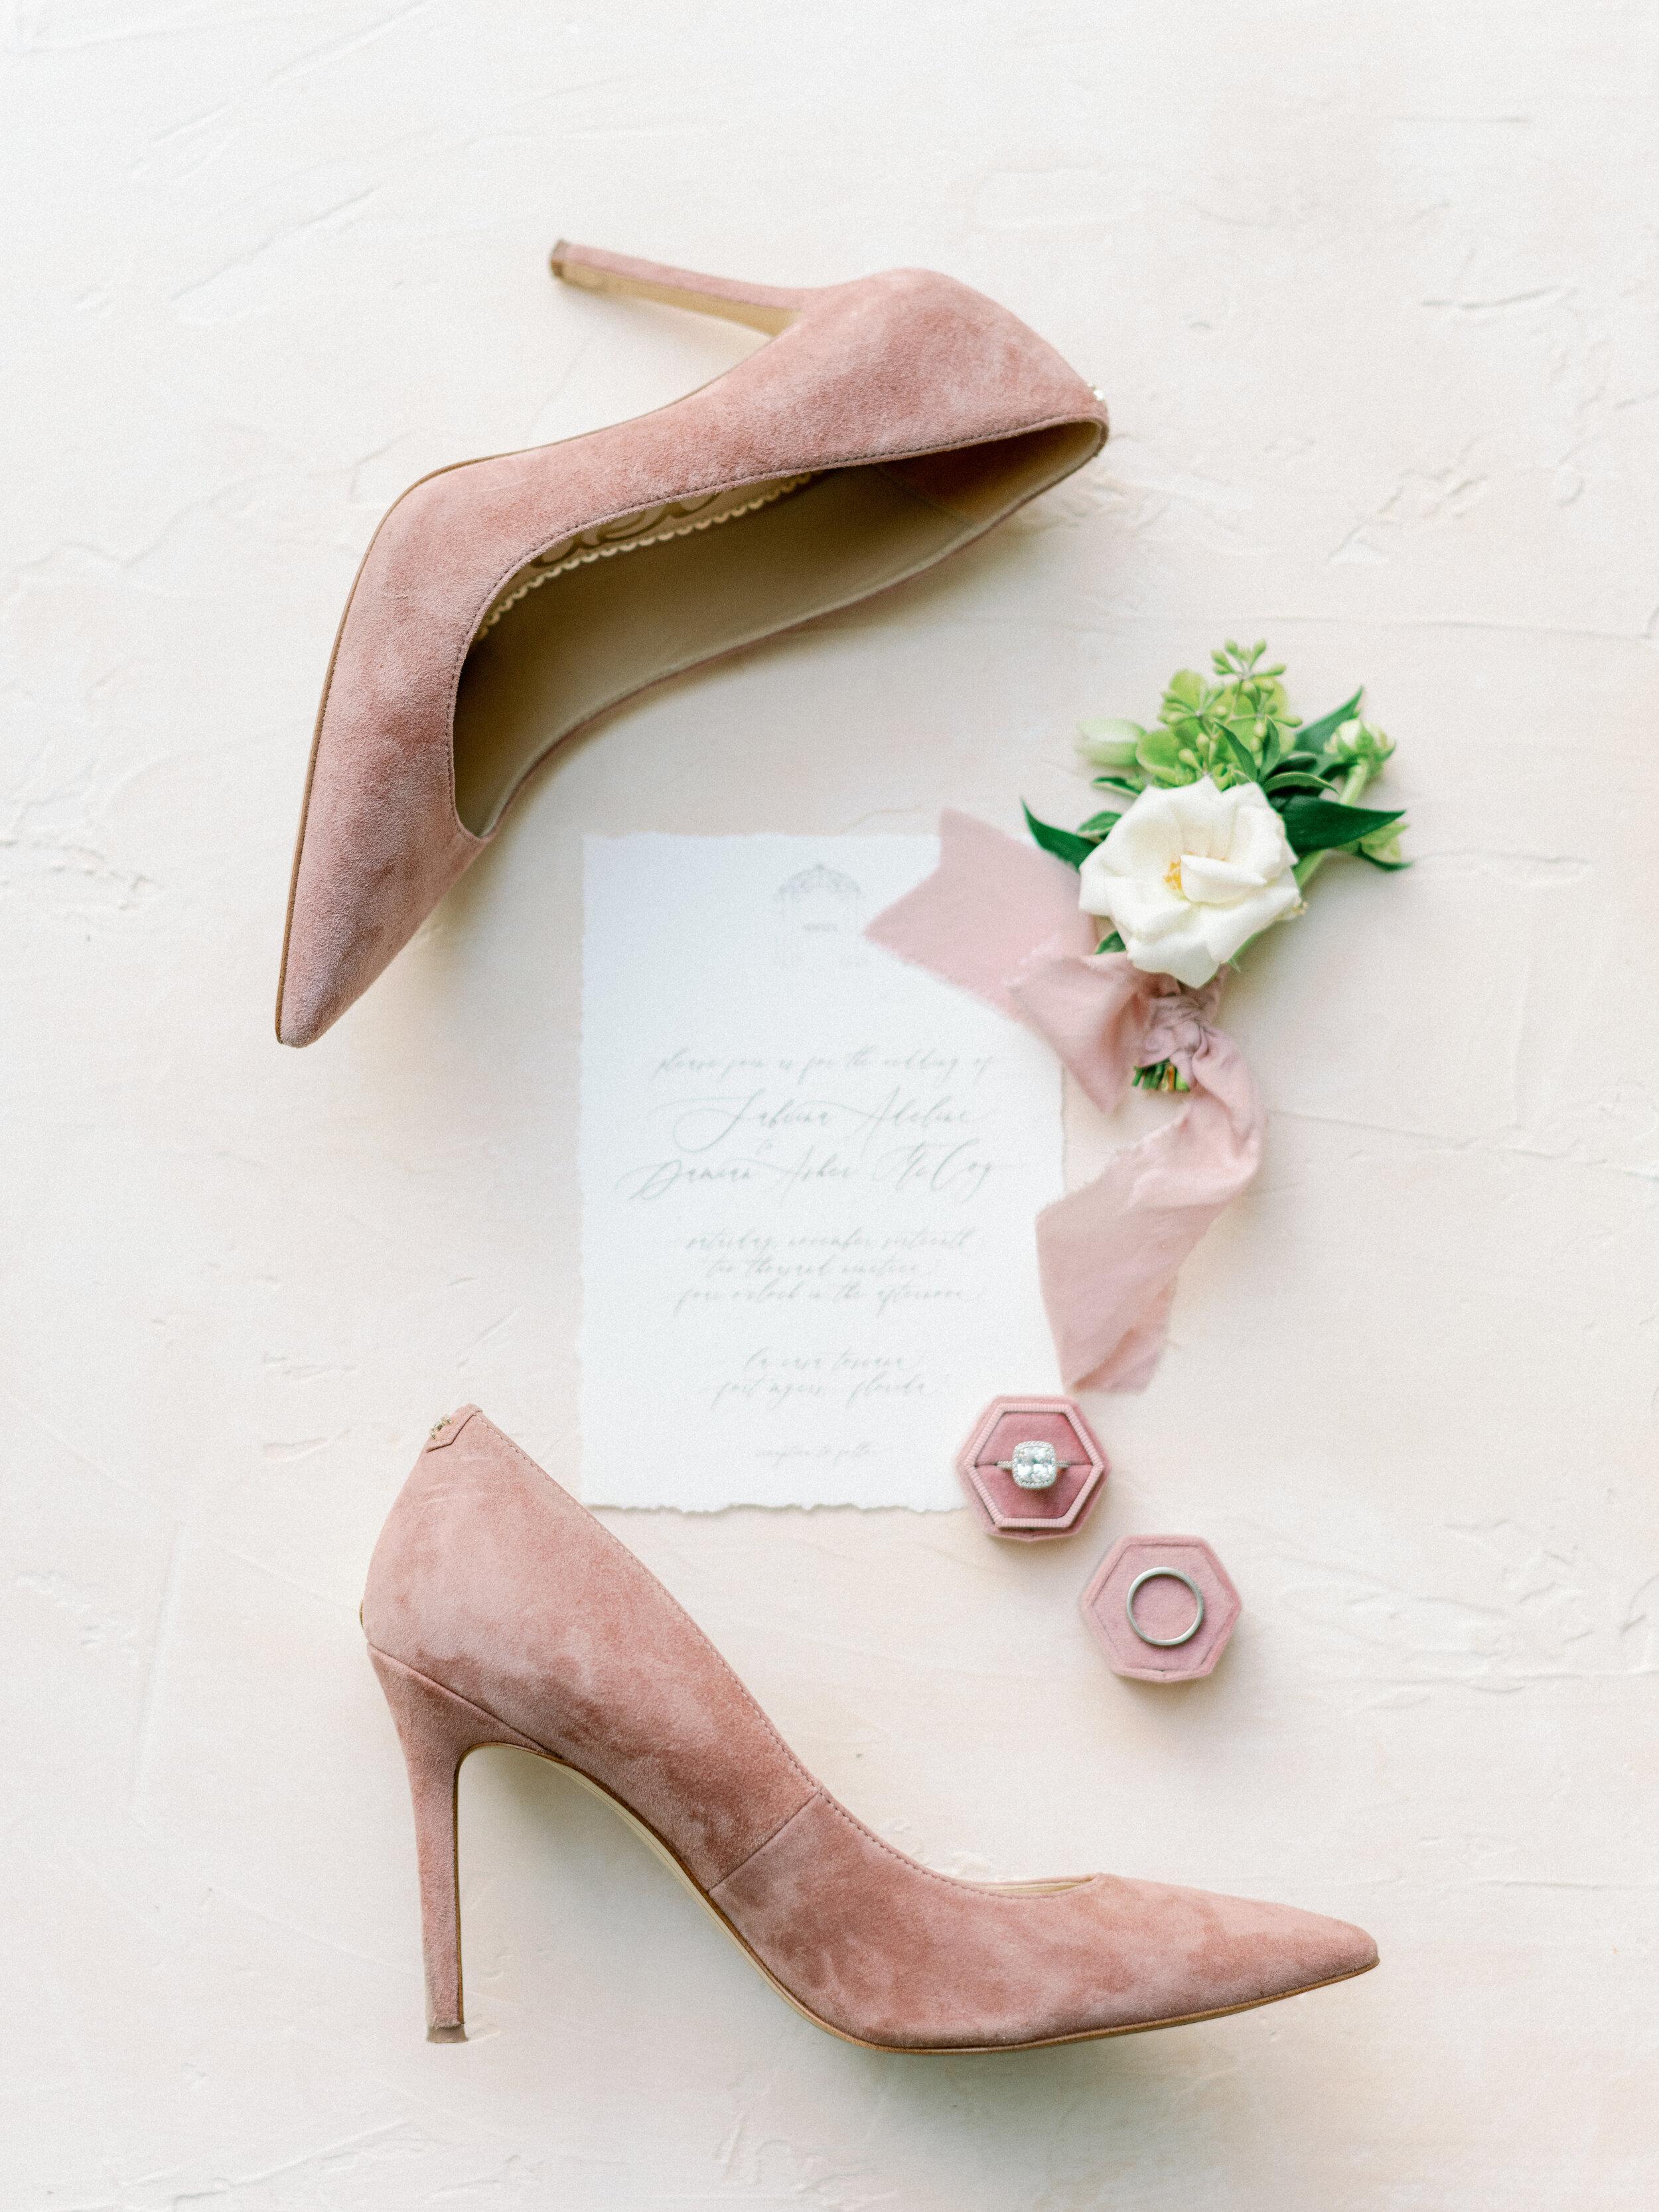 florida-wedding-fort-myers-la-casa-toscana-outdoor-ceremony-winter-wedding-brown-chairs-white-gazebo-planned-by-mostly-becky-weddings-traveling-wedding-planner-destination-wedding-lakeside-bridal-portraits-bride-groom-black-tie-tux-formal-wedding